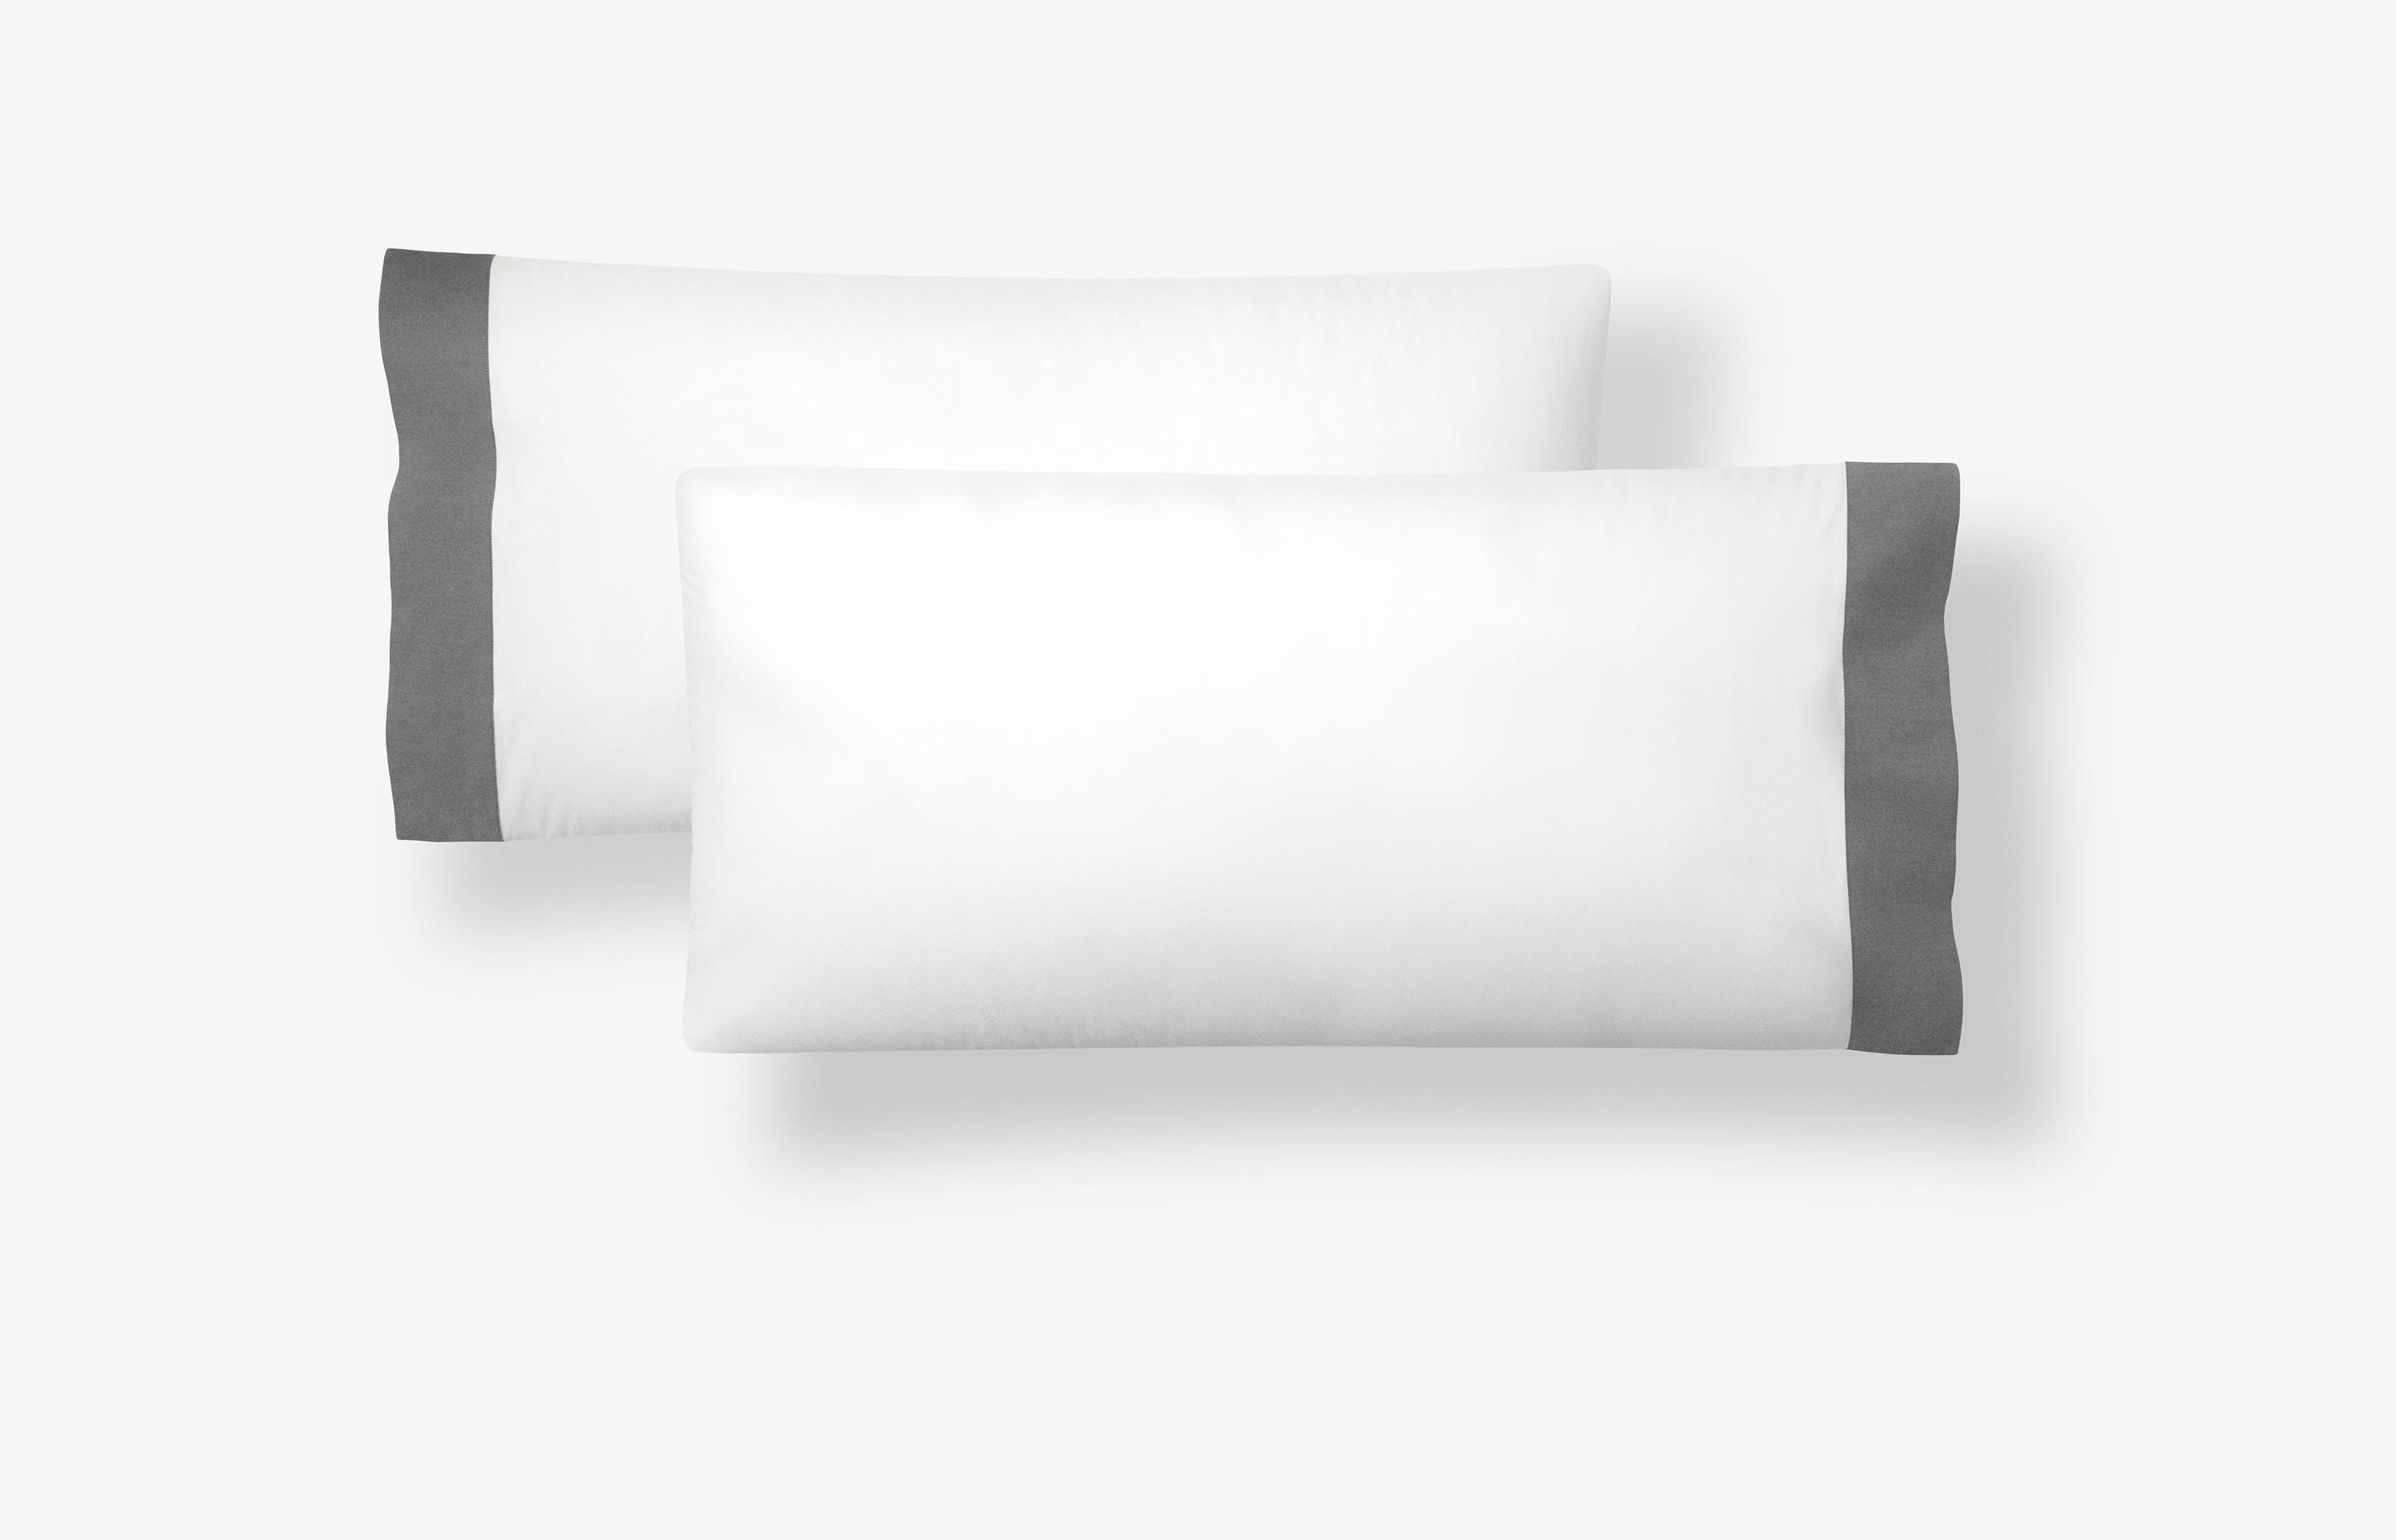 Casper Bettwäsche Kissenbezug – chambray Weiß